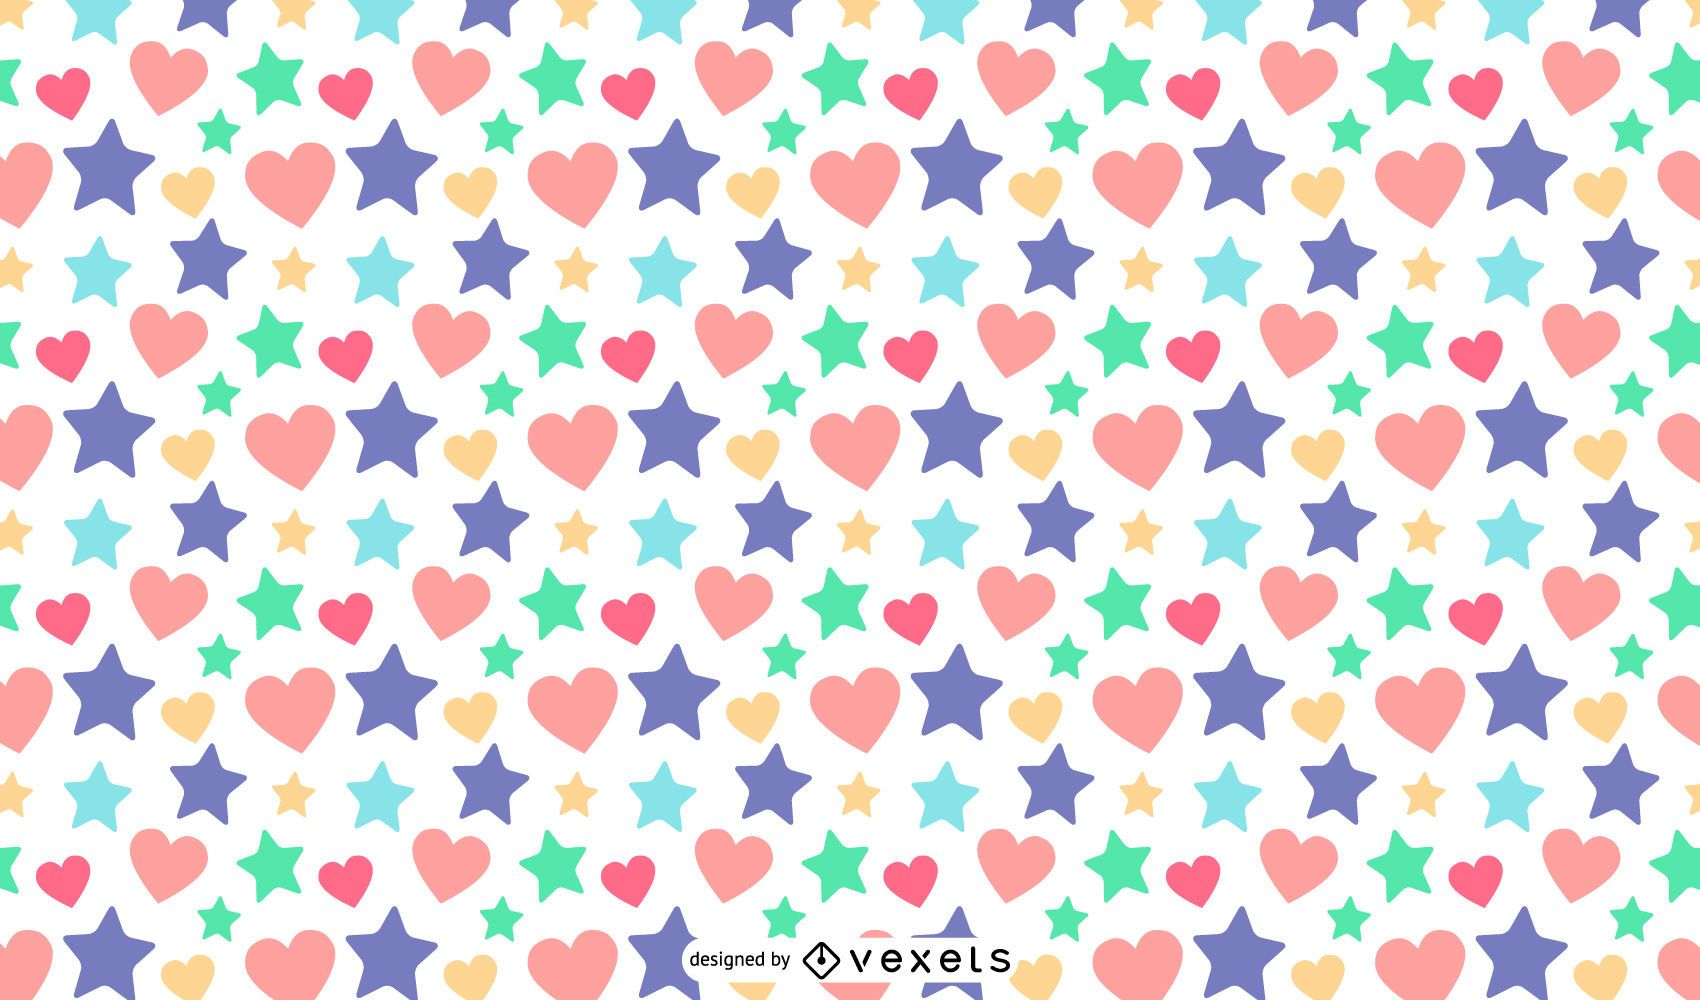 Stars hearts pattern design